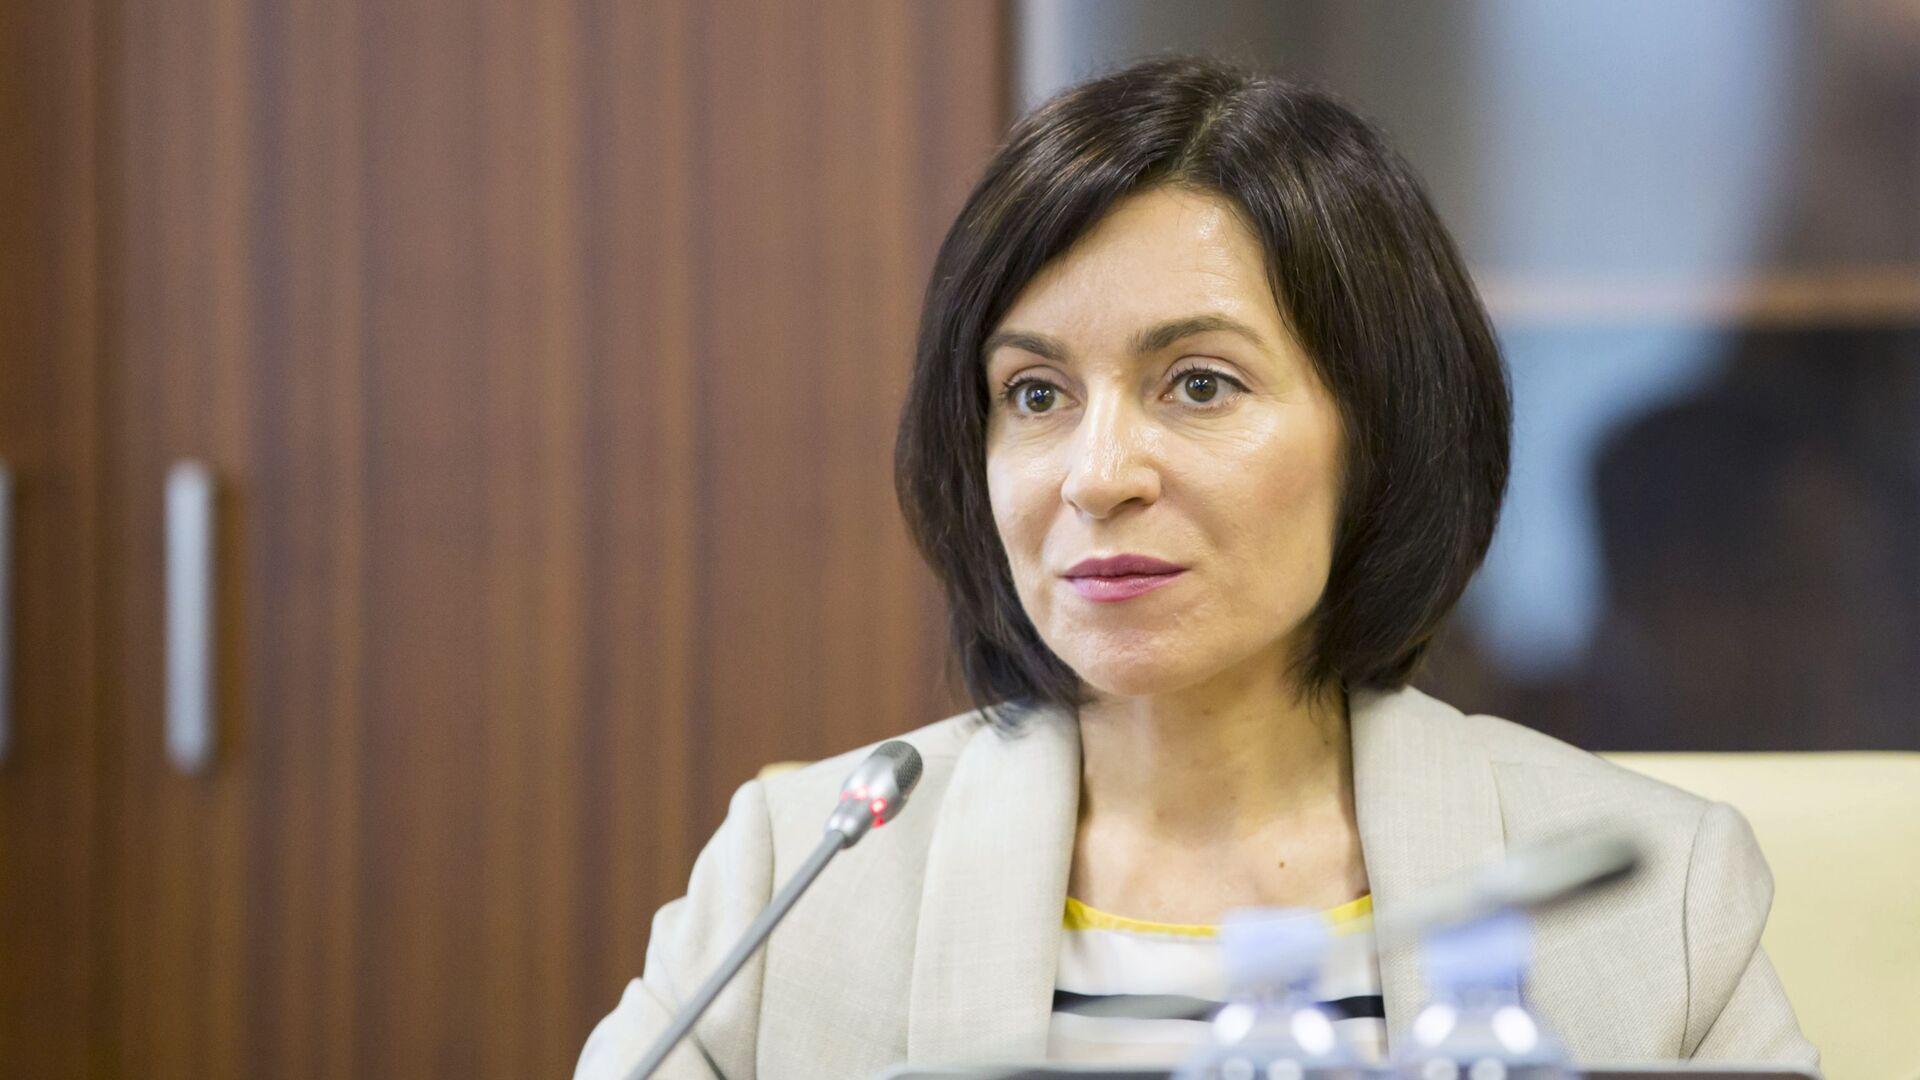 Maia Sandu, primera ministra de Moldavia - Sputnik Mundo, 1920, 18.04.2021